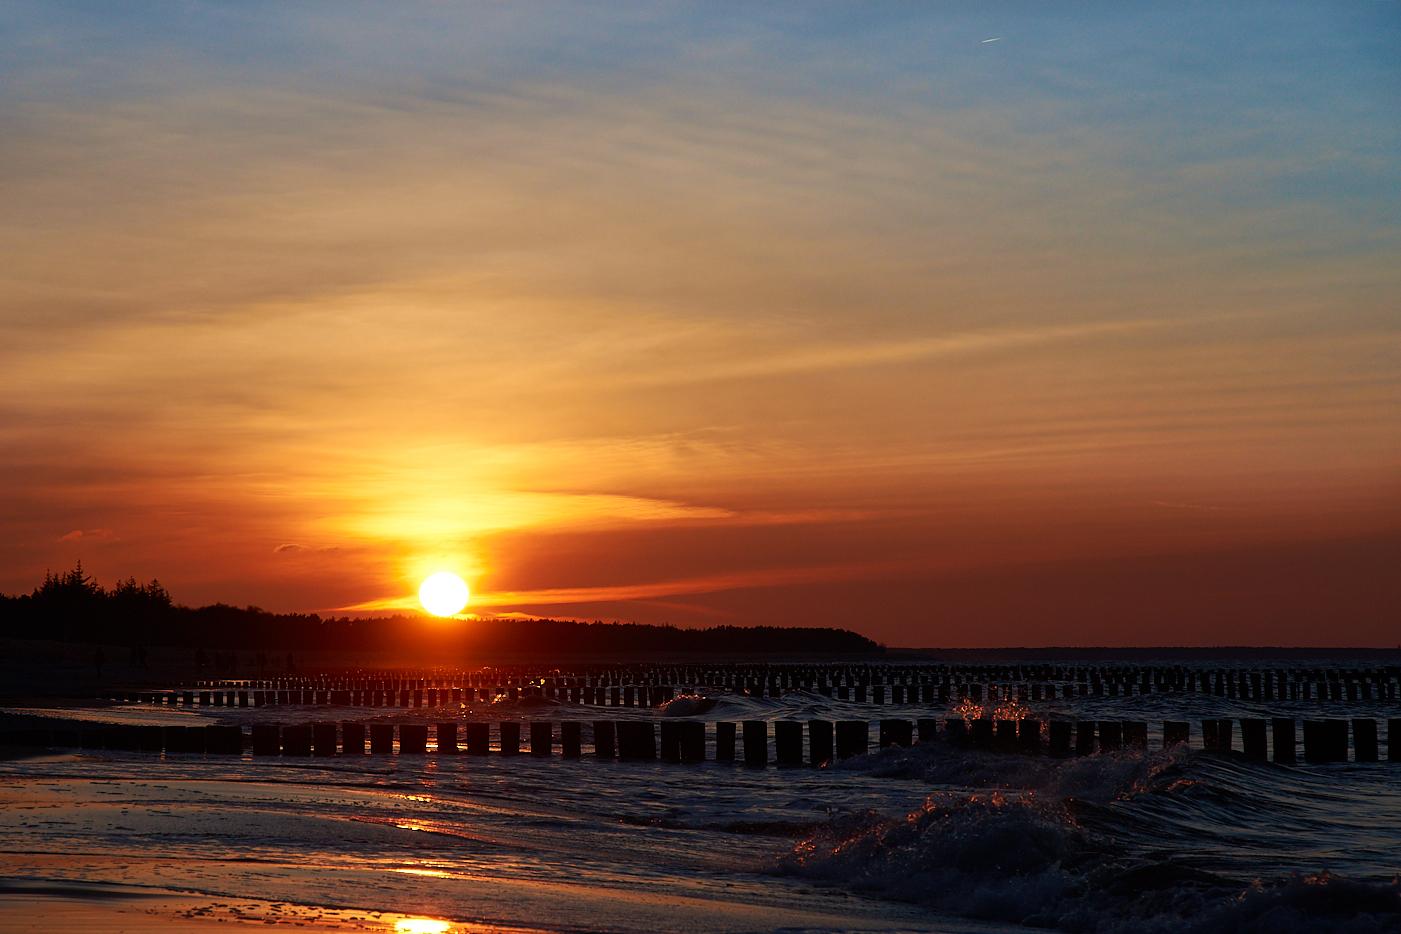 Sonnenuntergang am Strand - Zingst - ankofoto